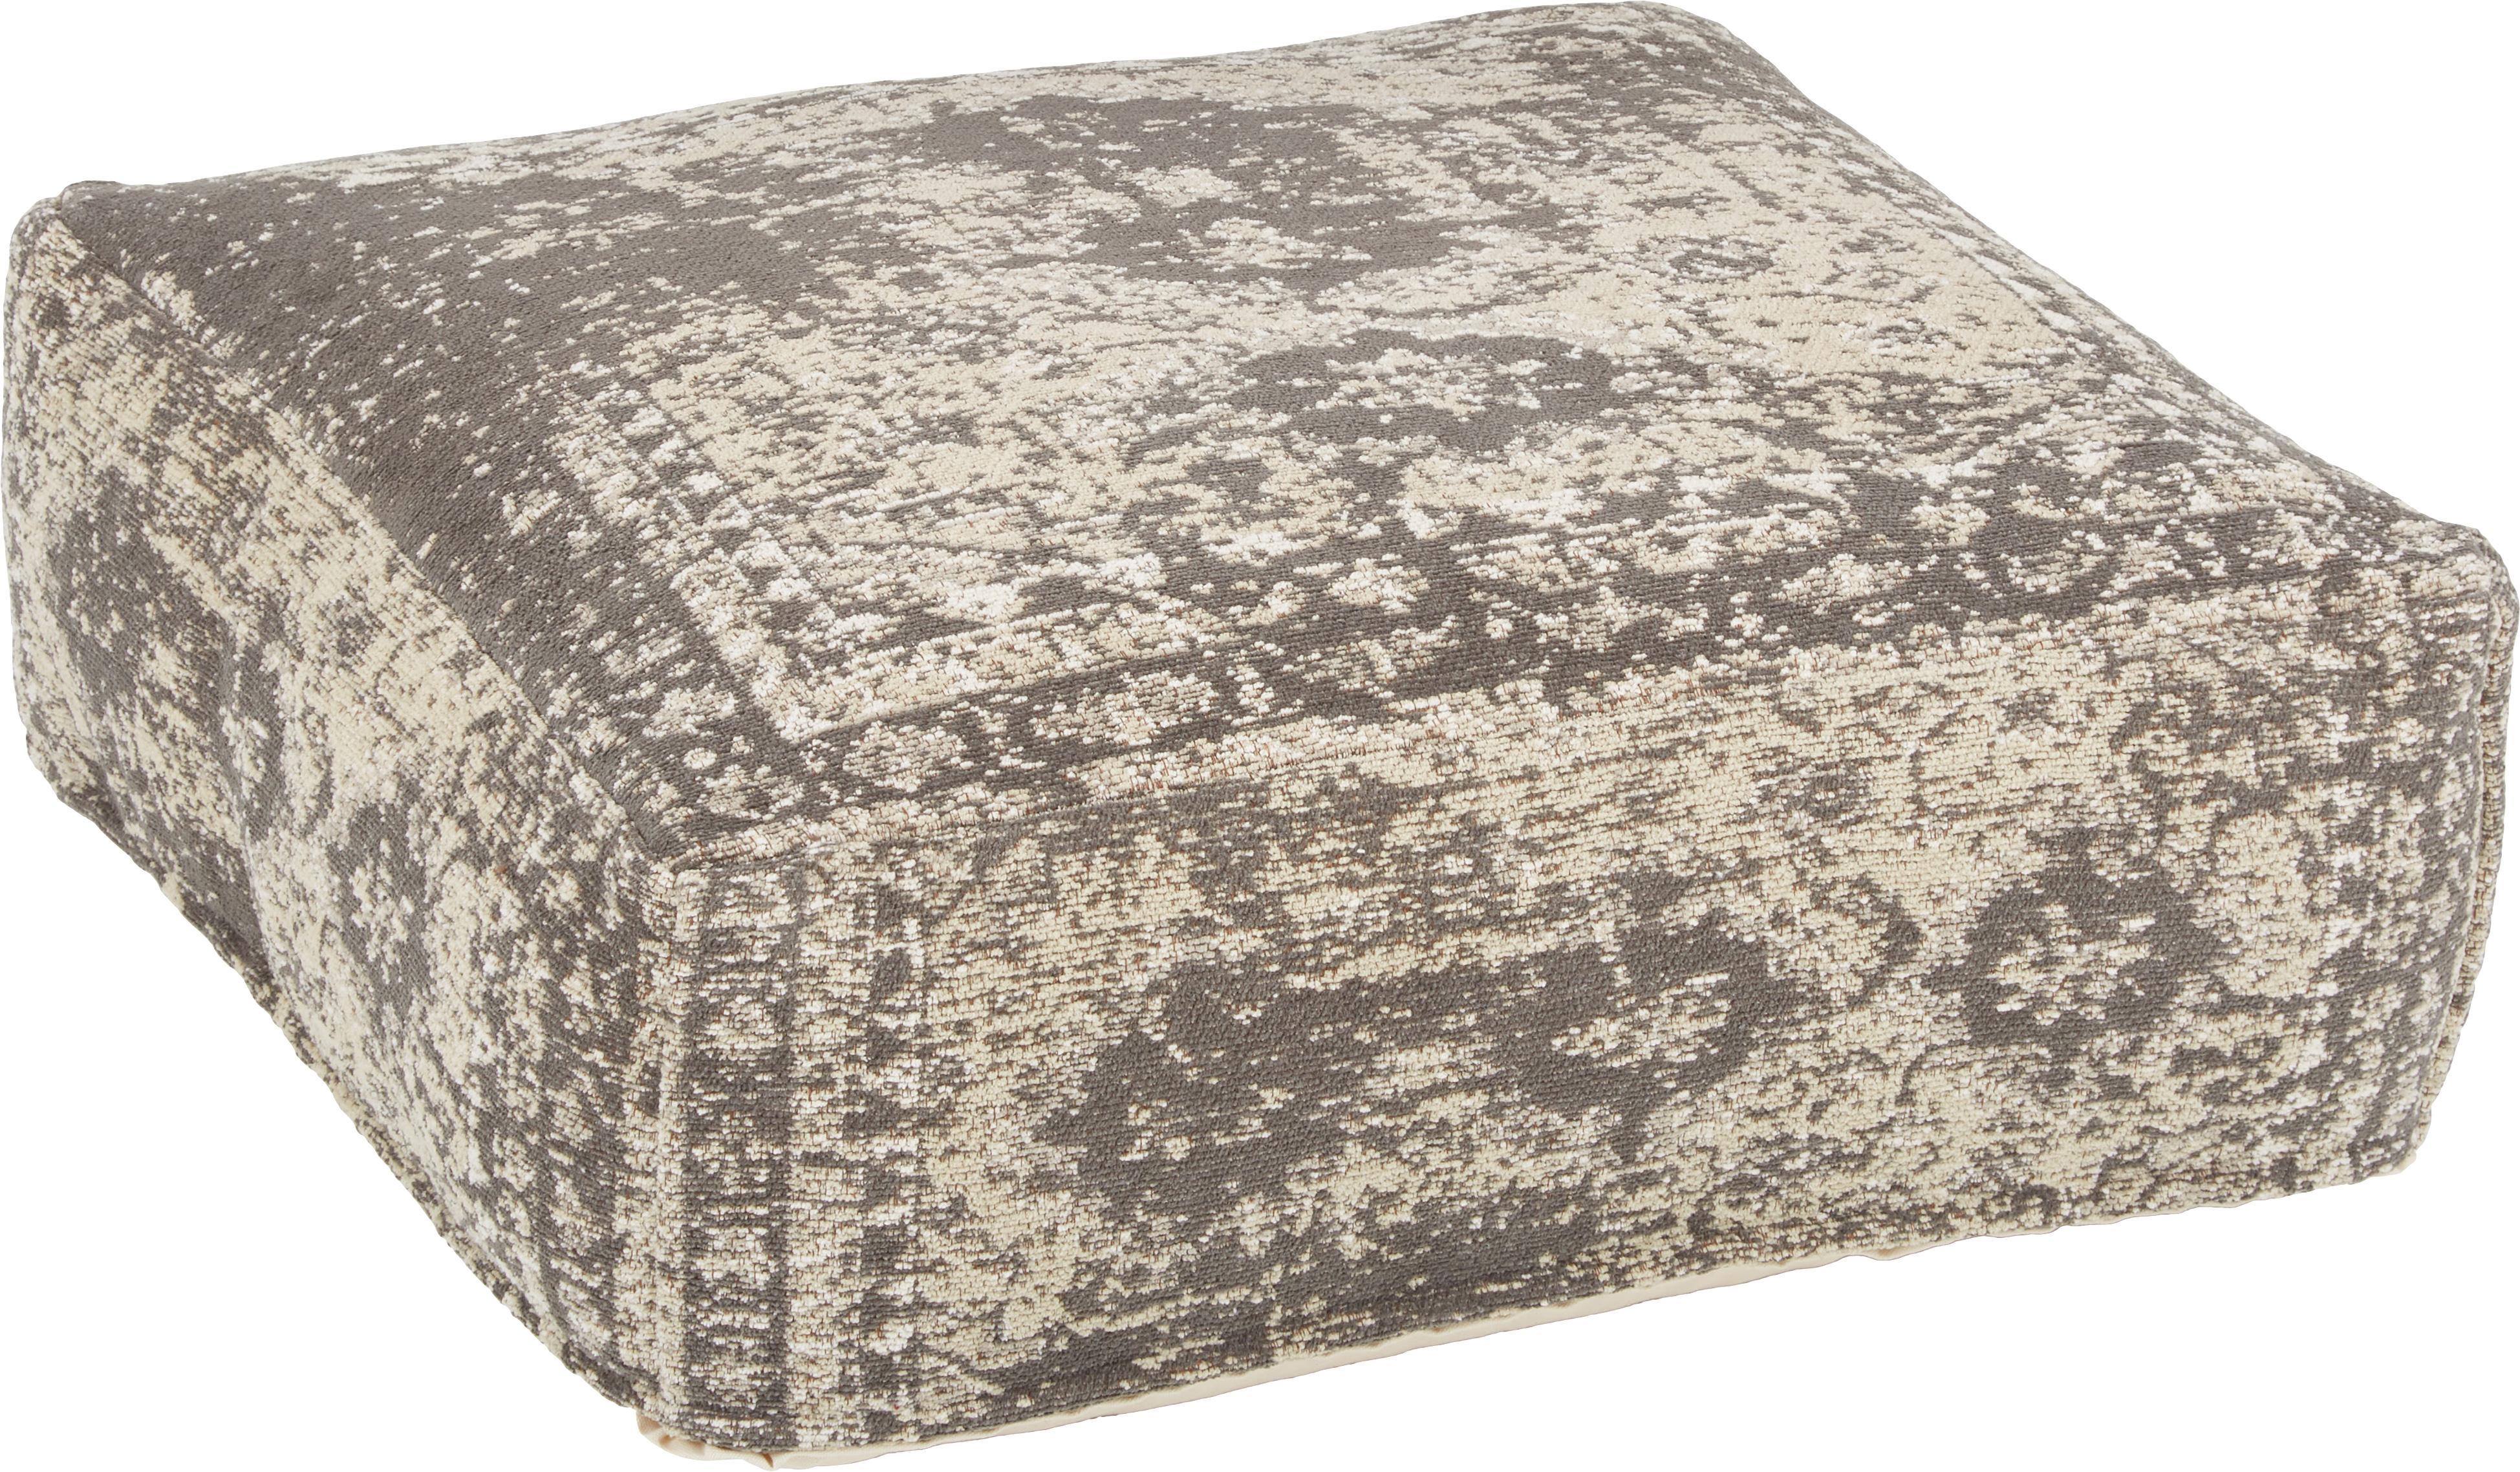 Cojín de suelo Rebel, estilo vintage, Funda: 95%algodón, 5%poliéster, Interior: poliéster, Gris oscuro, crema, An 70 x Al 26 cm